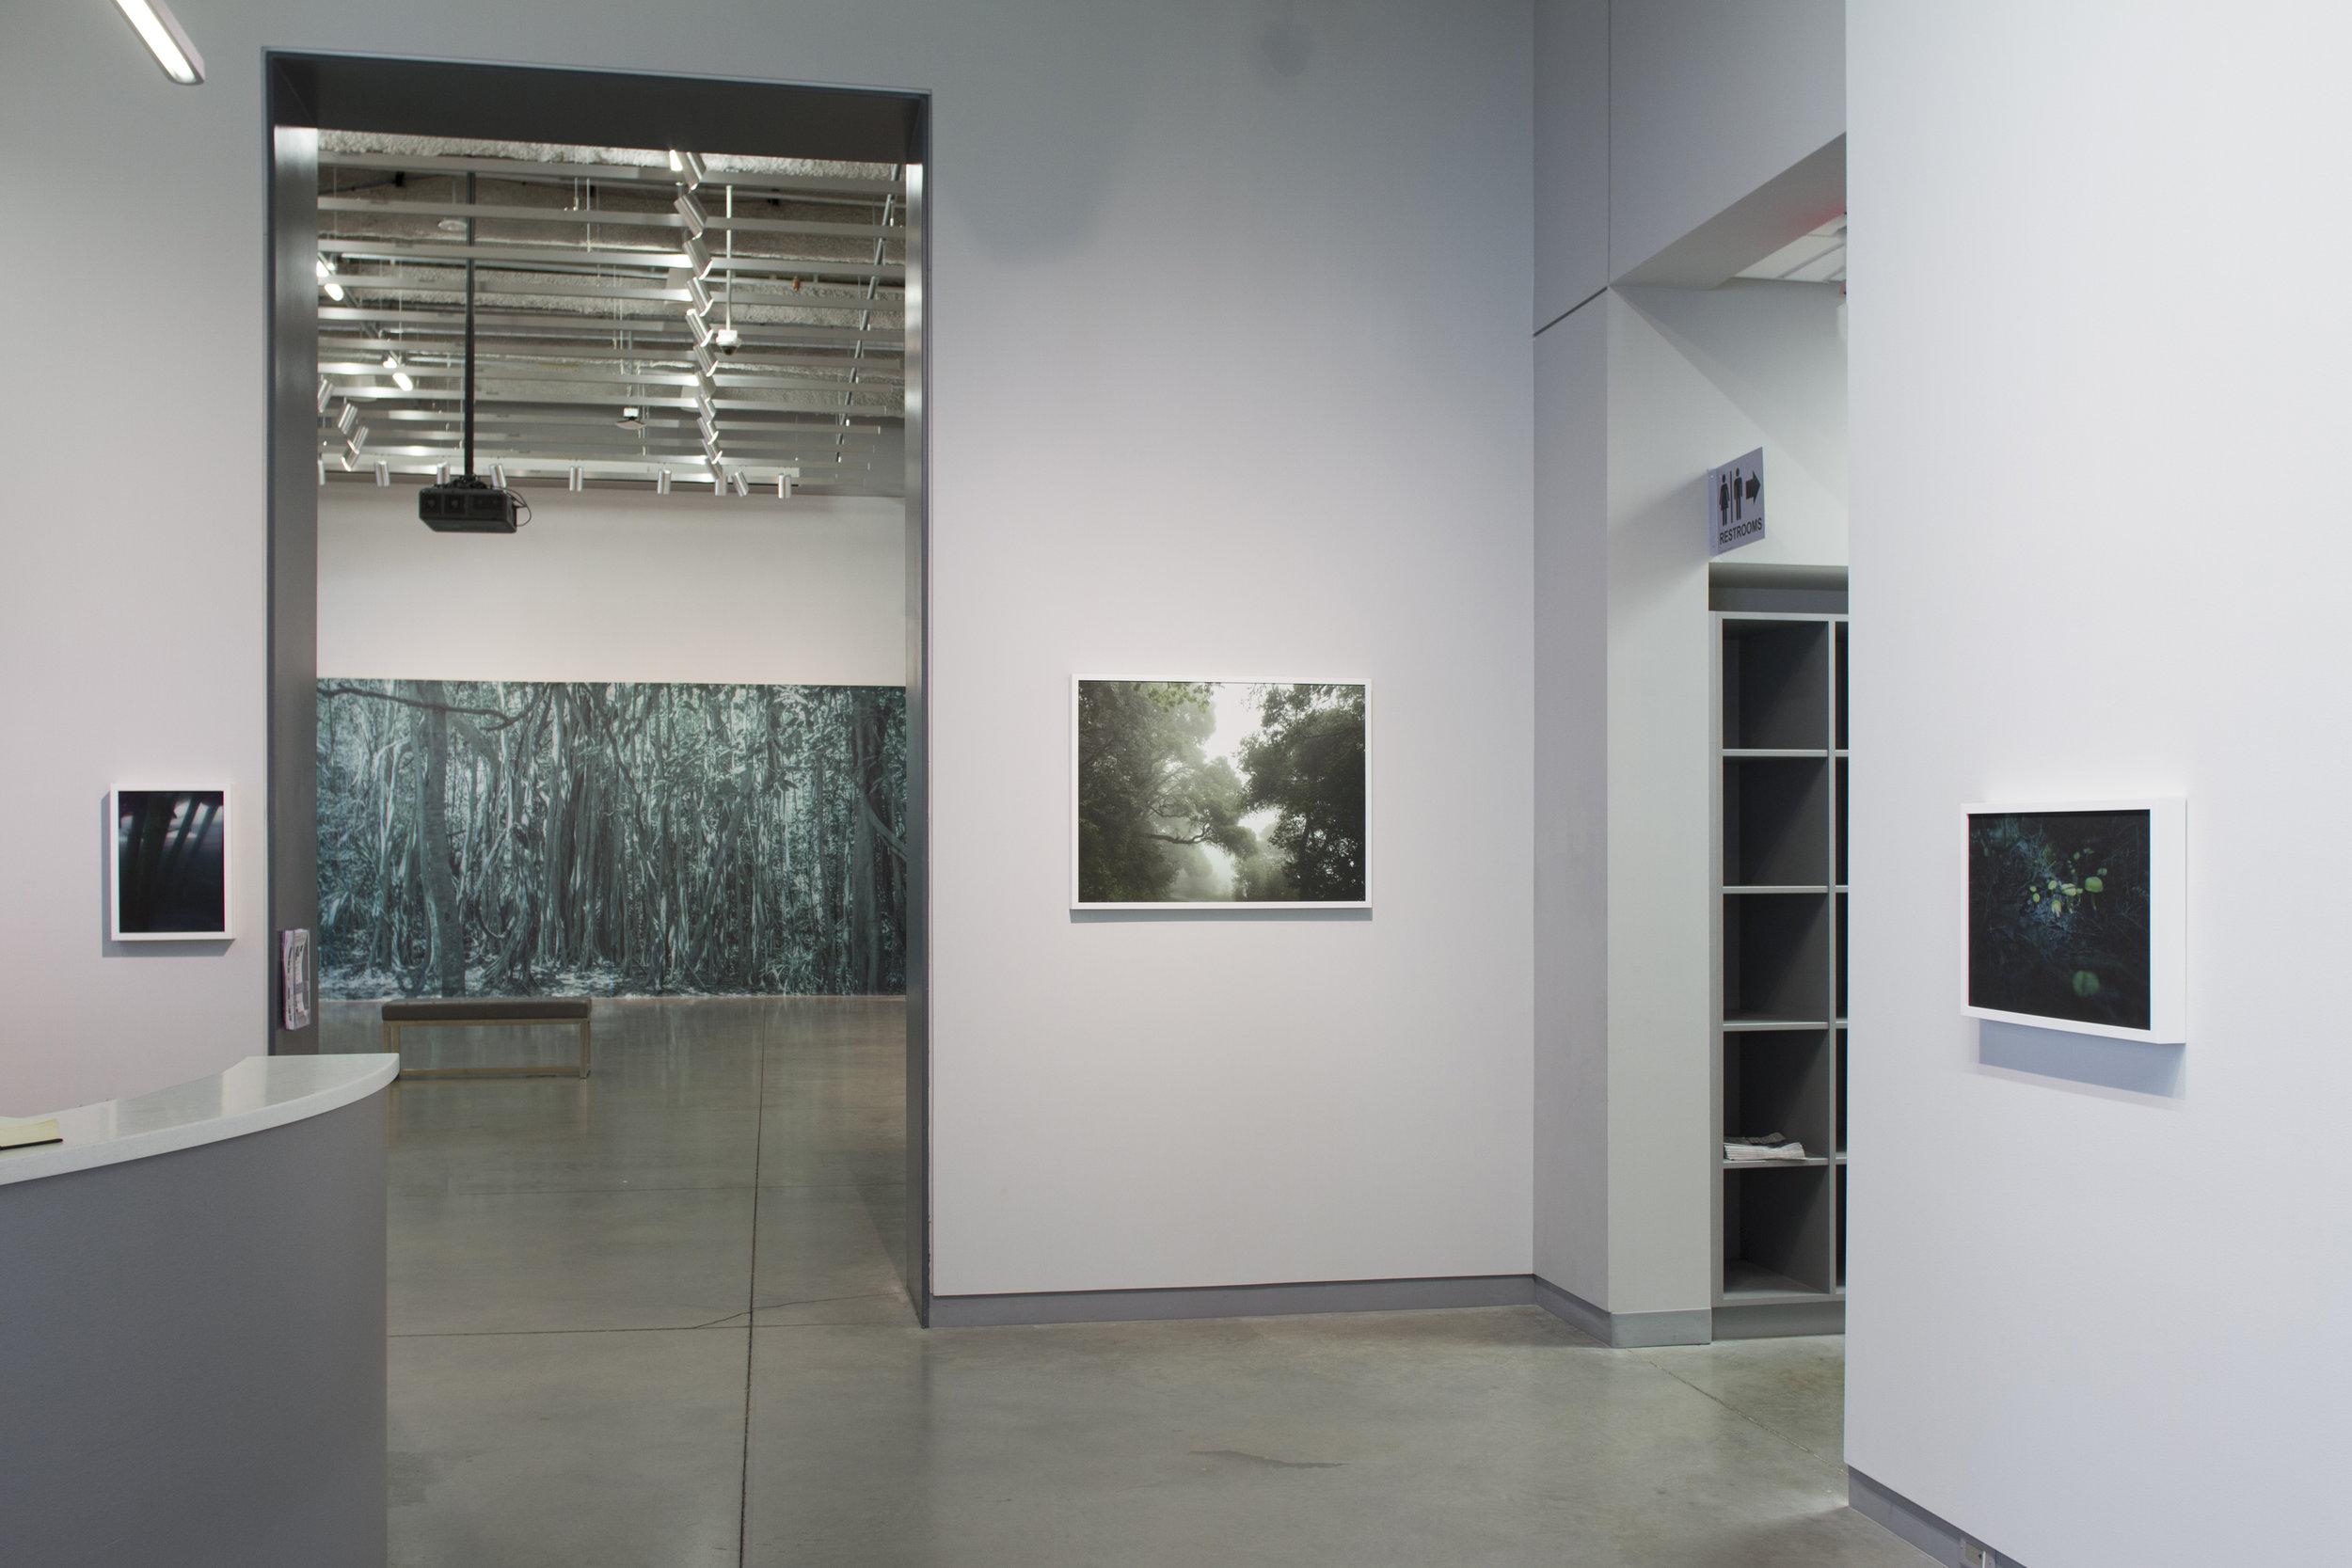 University Galleries, Paradise Wavering